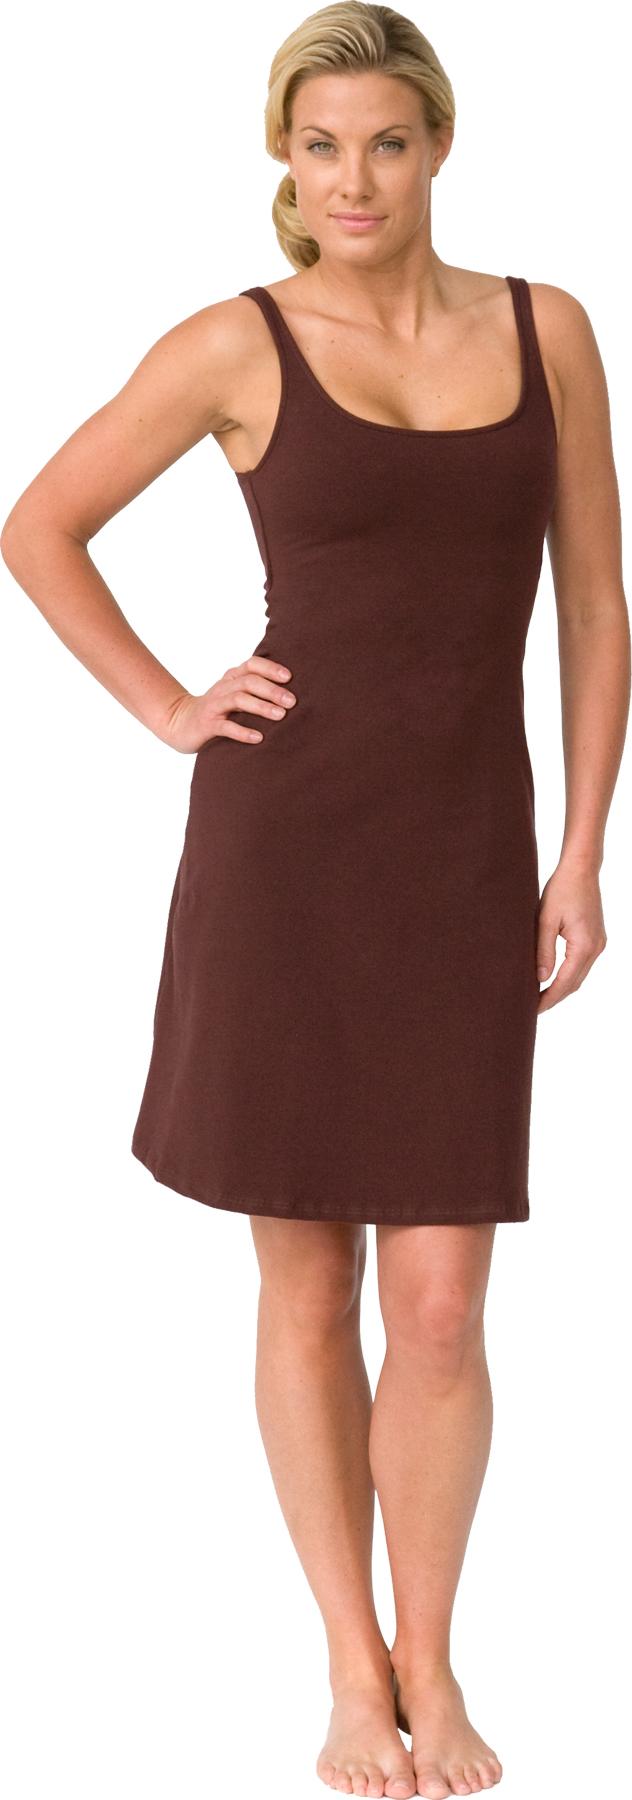 majamas-cozy-nursing-dress-cocoa-2.jpg